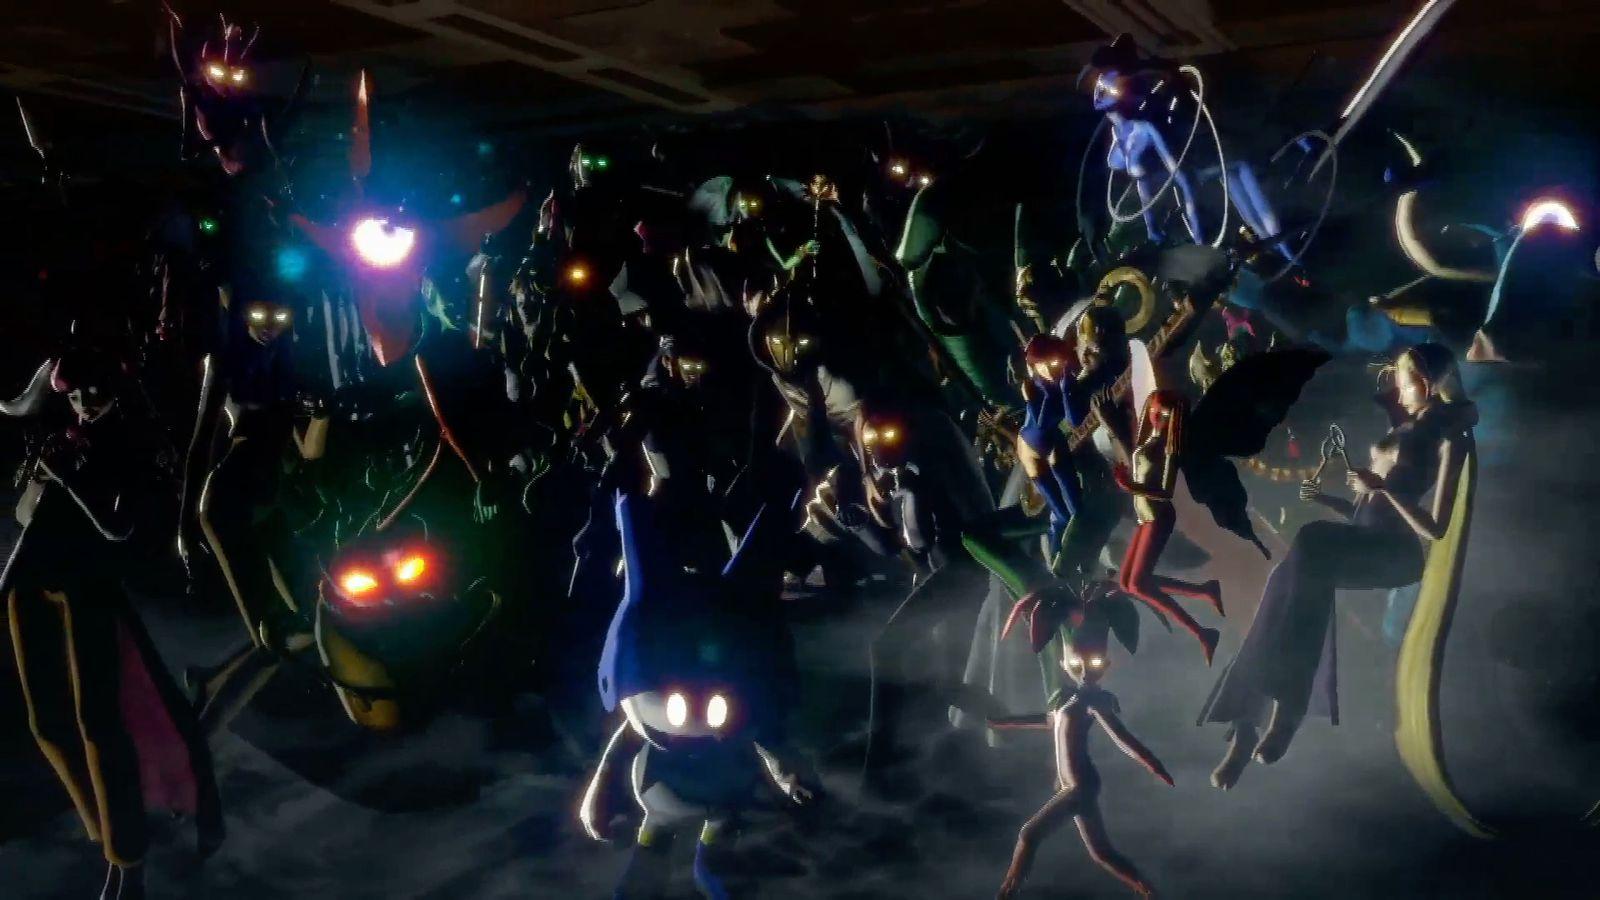 Wallpaper Destiny Hd Shin Megami Tensei Is Headed To Nintendo Switch Polygon